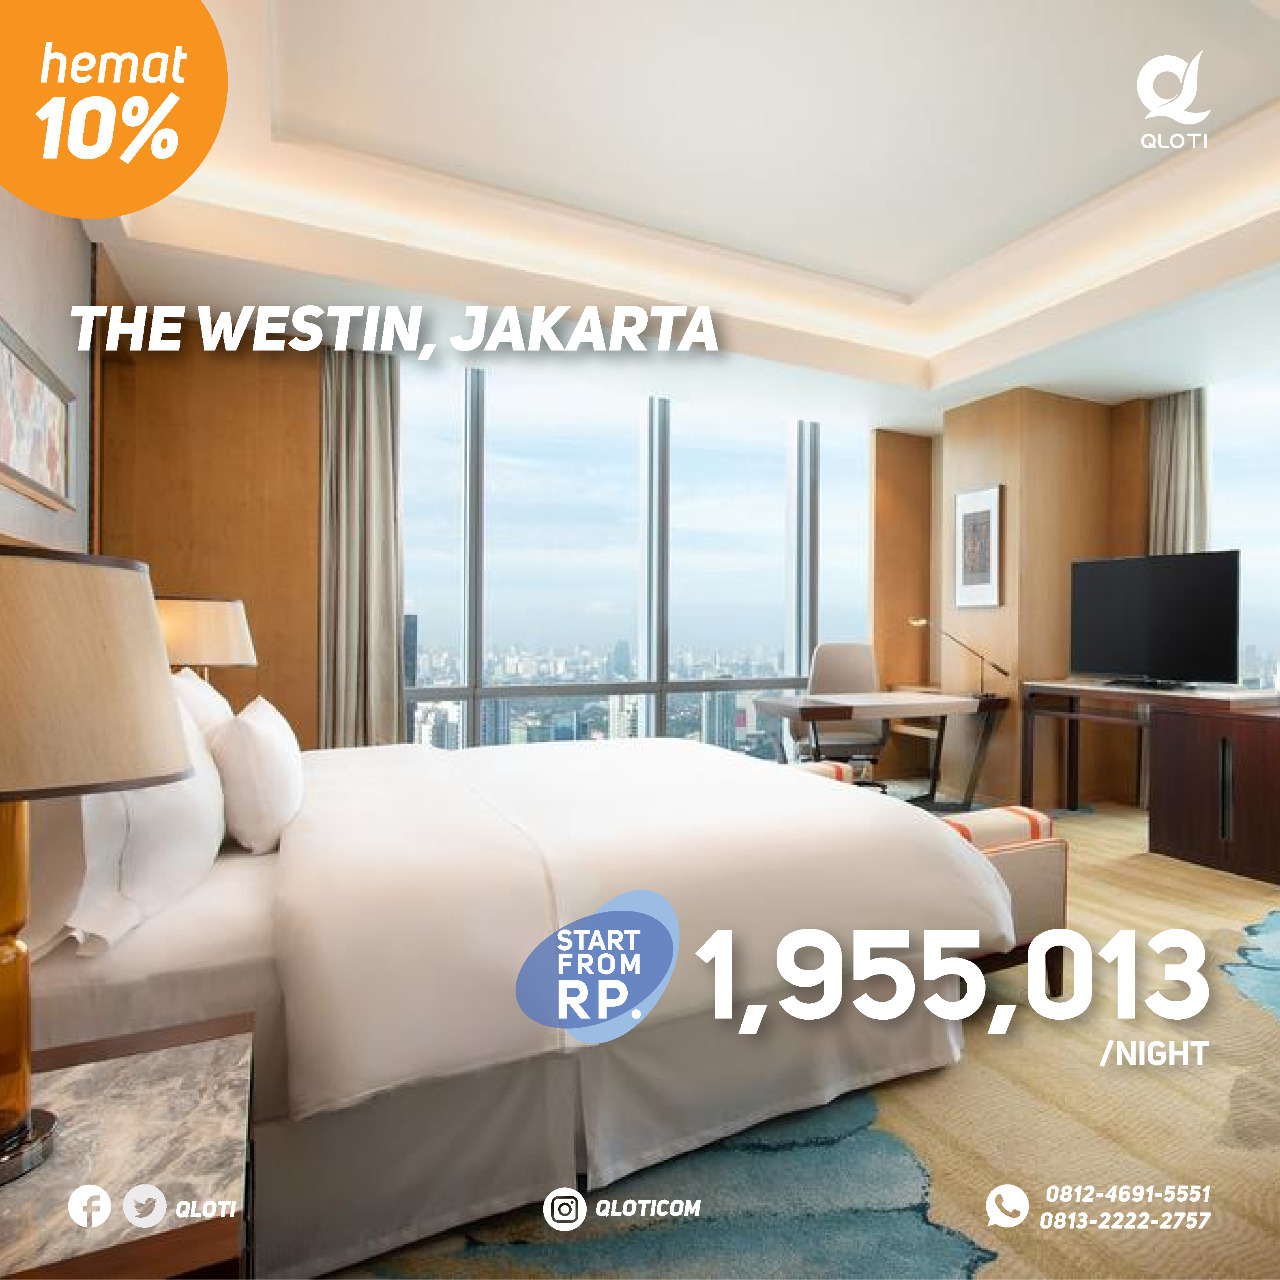 The Westin Jakarta - yoexplore, liburan keluarga - yoexplore.co.id